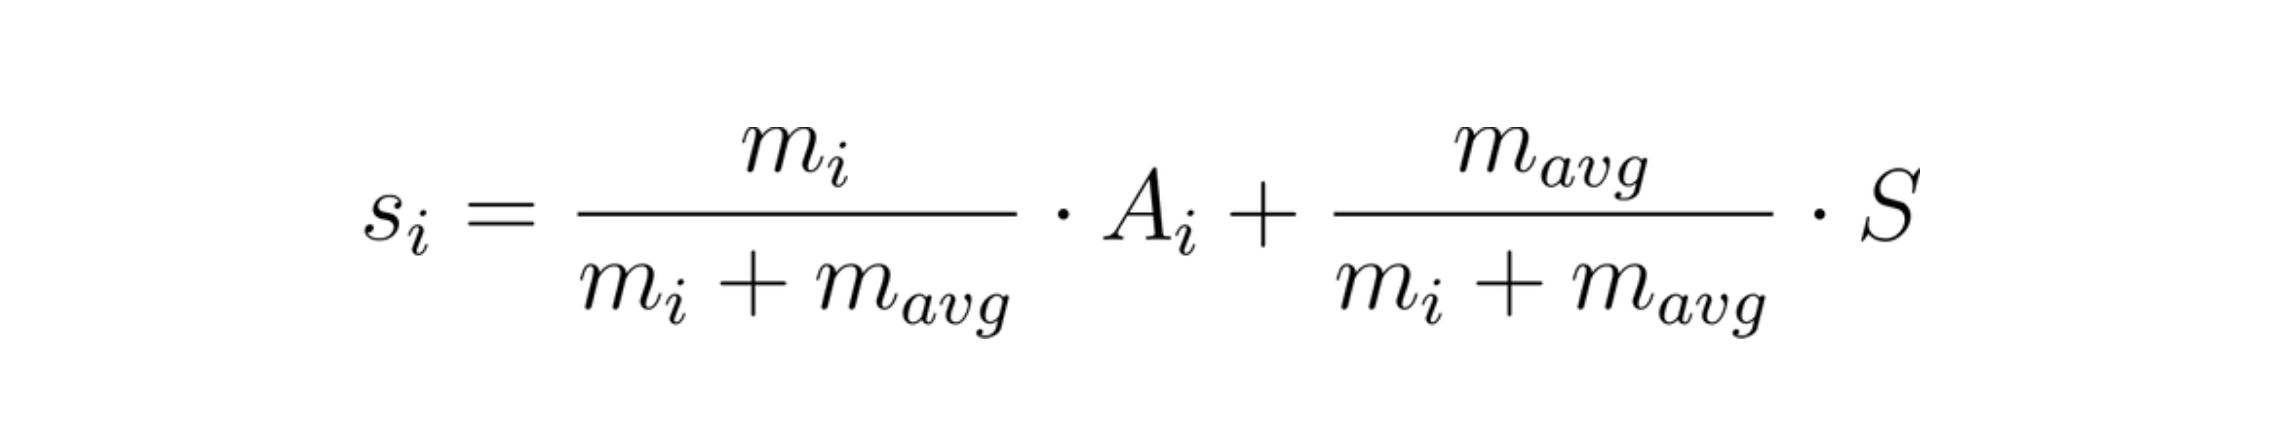 scoring function for bayesian average rating system